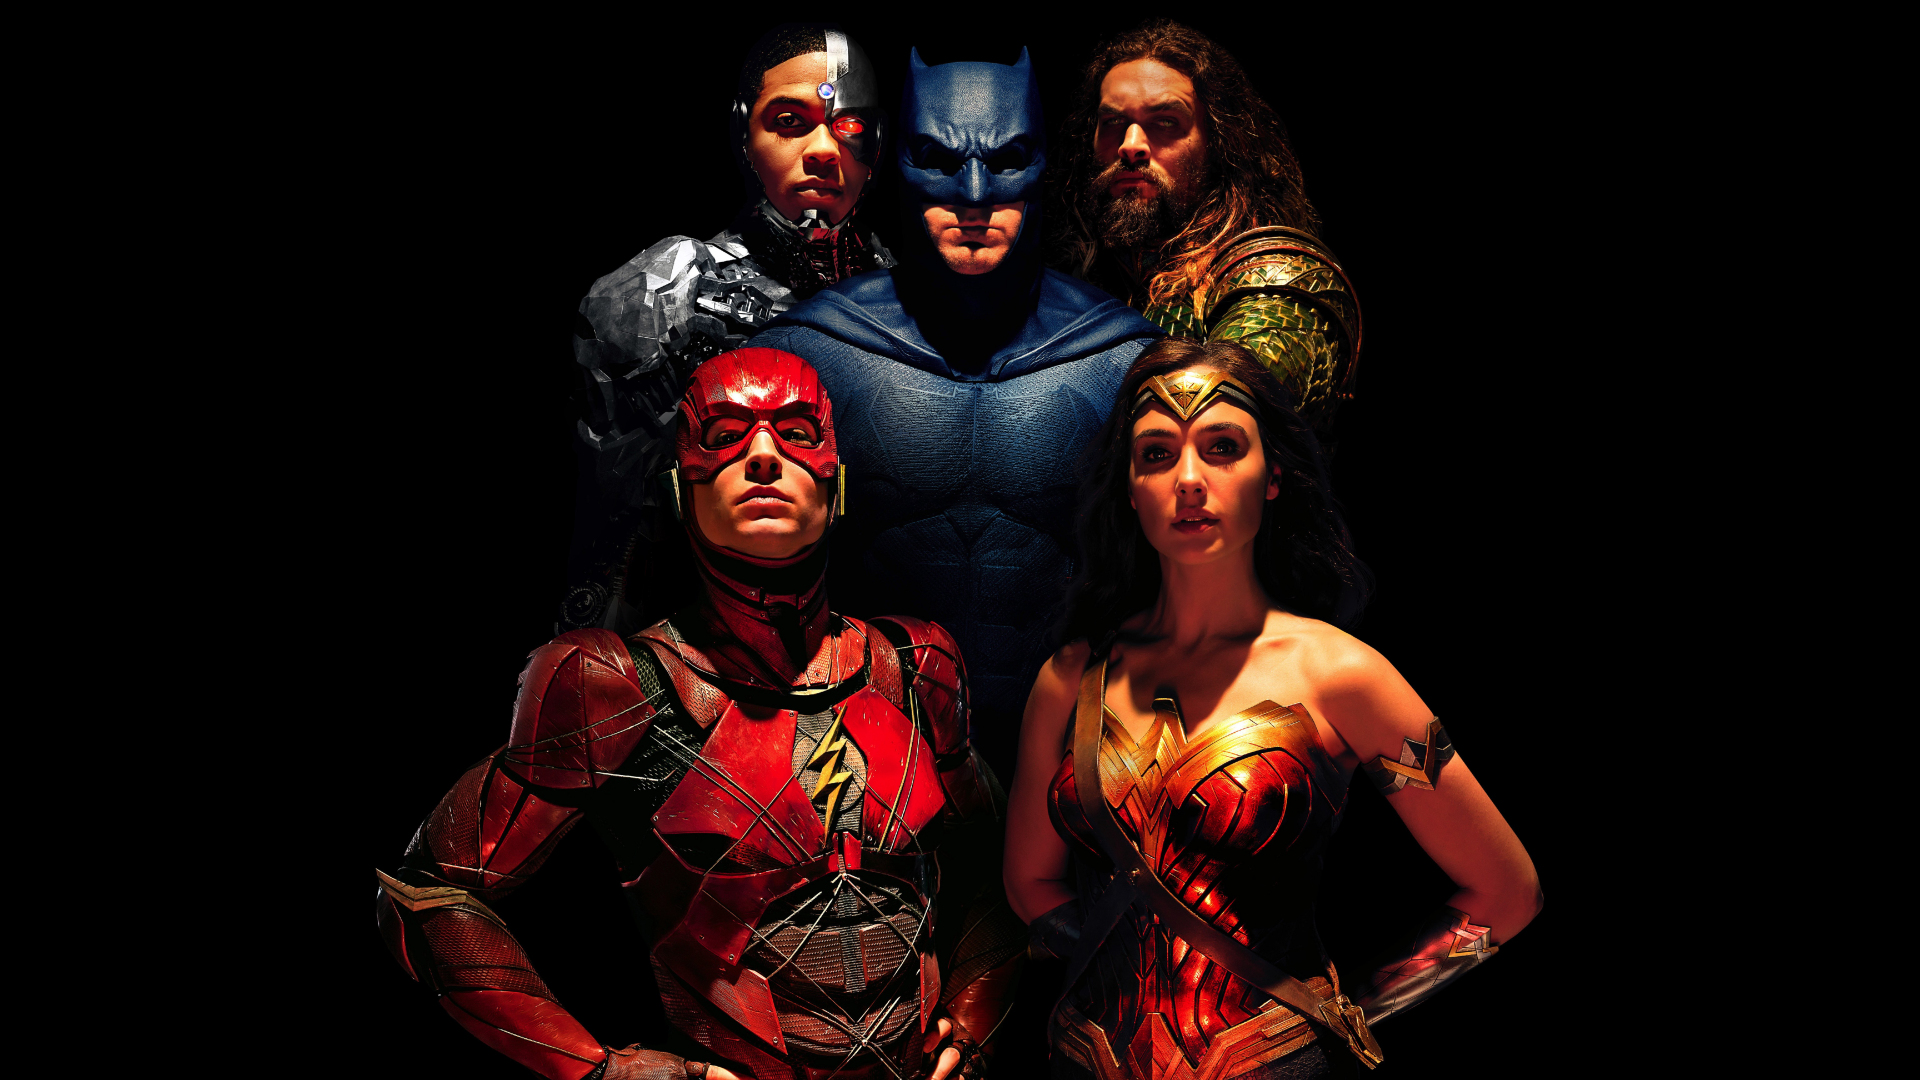 Download 1920x1080 Wallpaper Justice League Team Batman Wonder